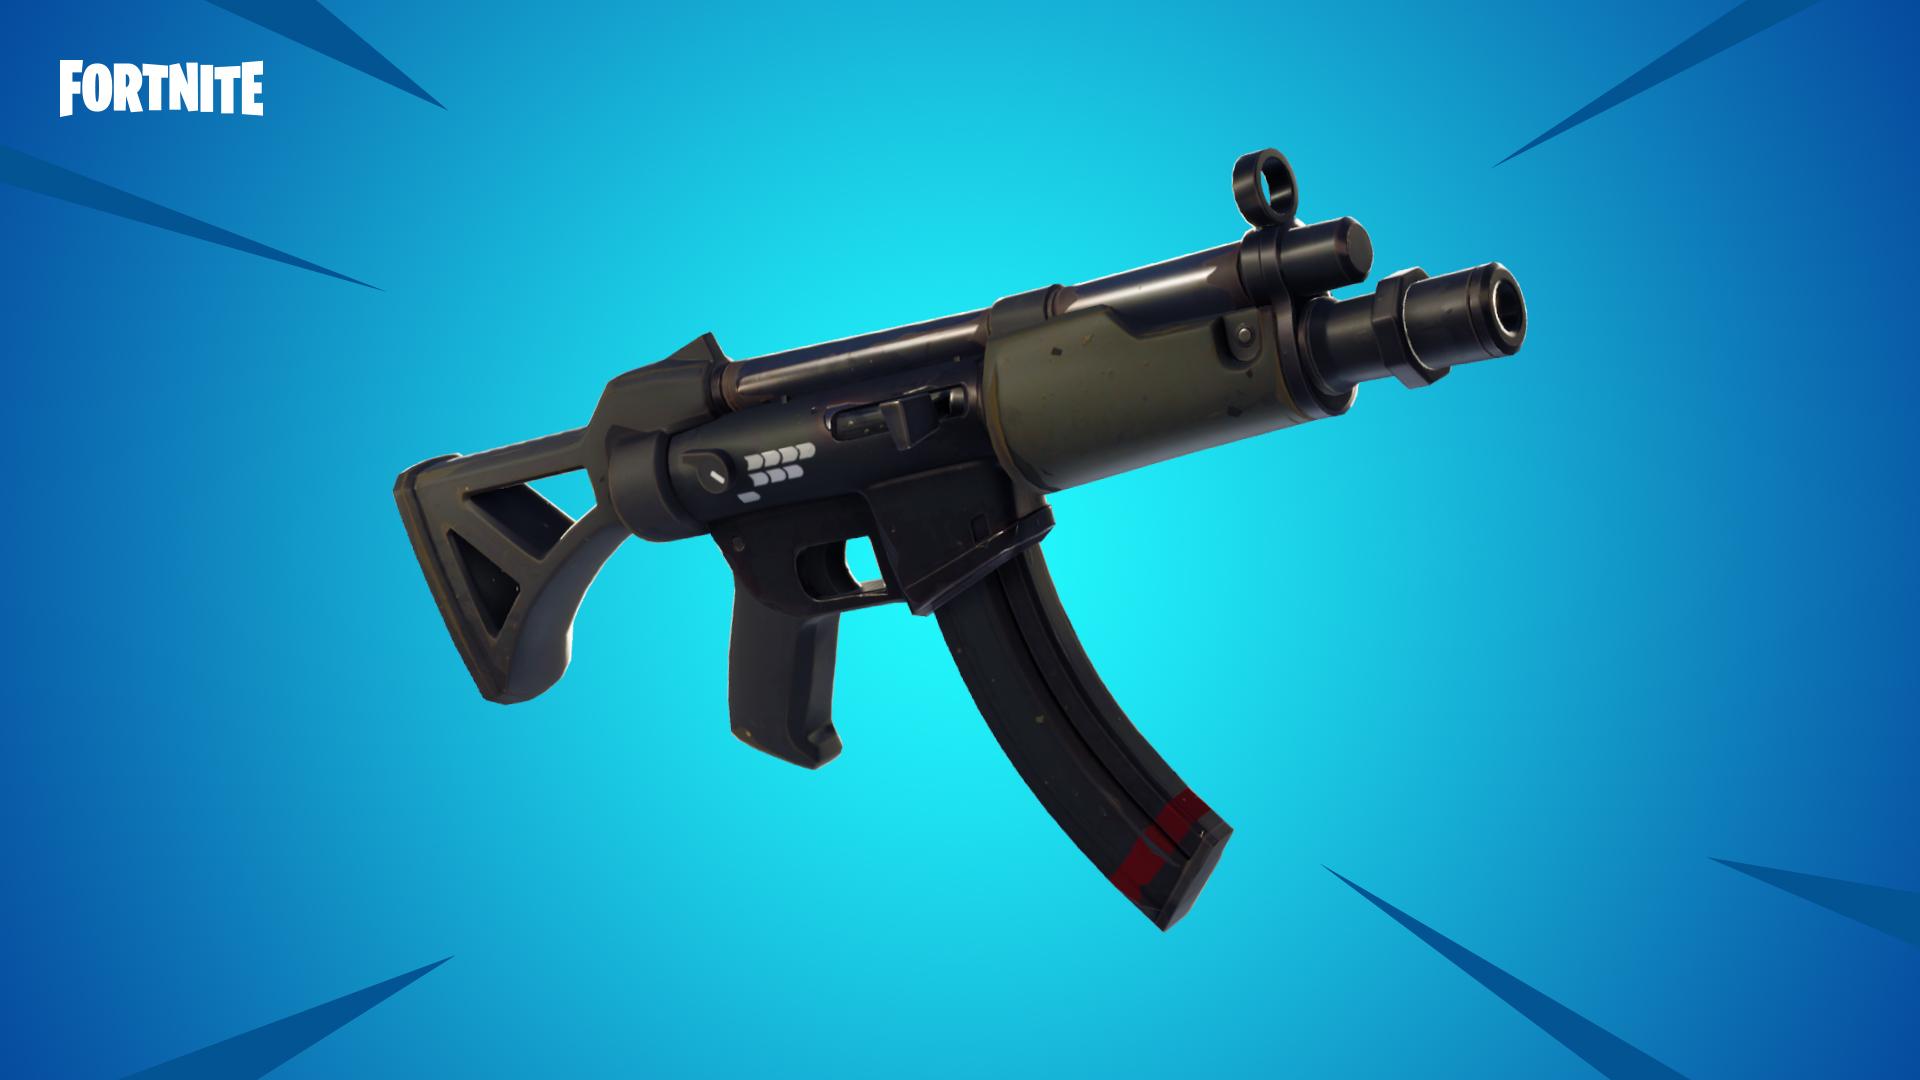 Fortnite-MP-01